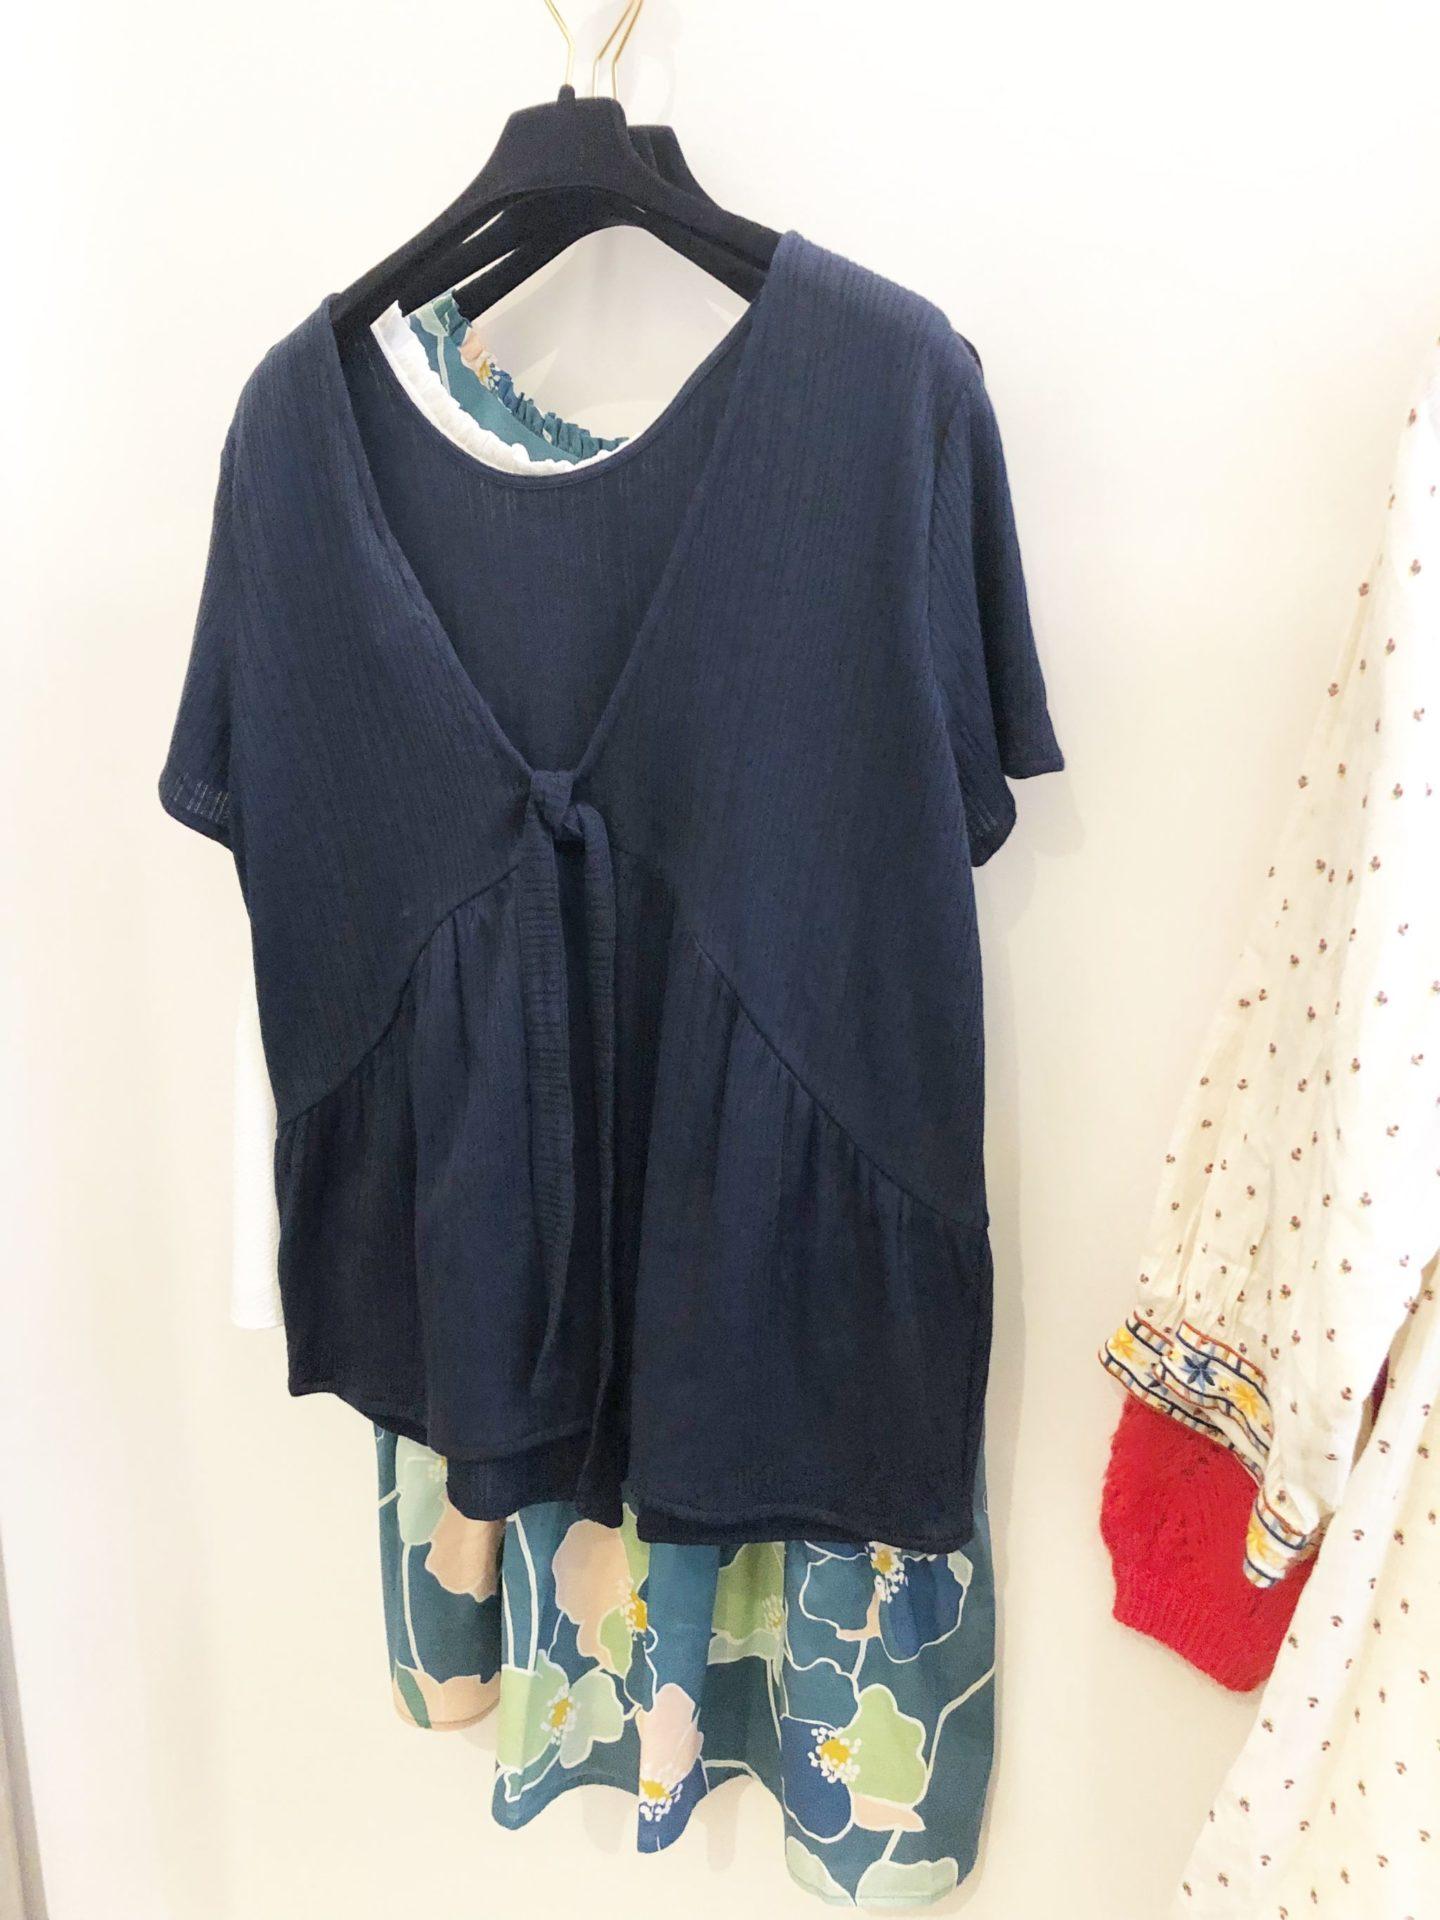 Ninon T-Shirt, Sezane Try-Ons